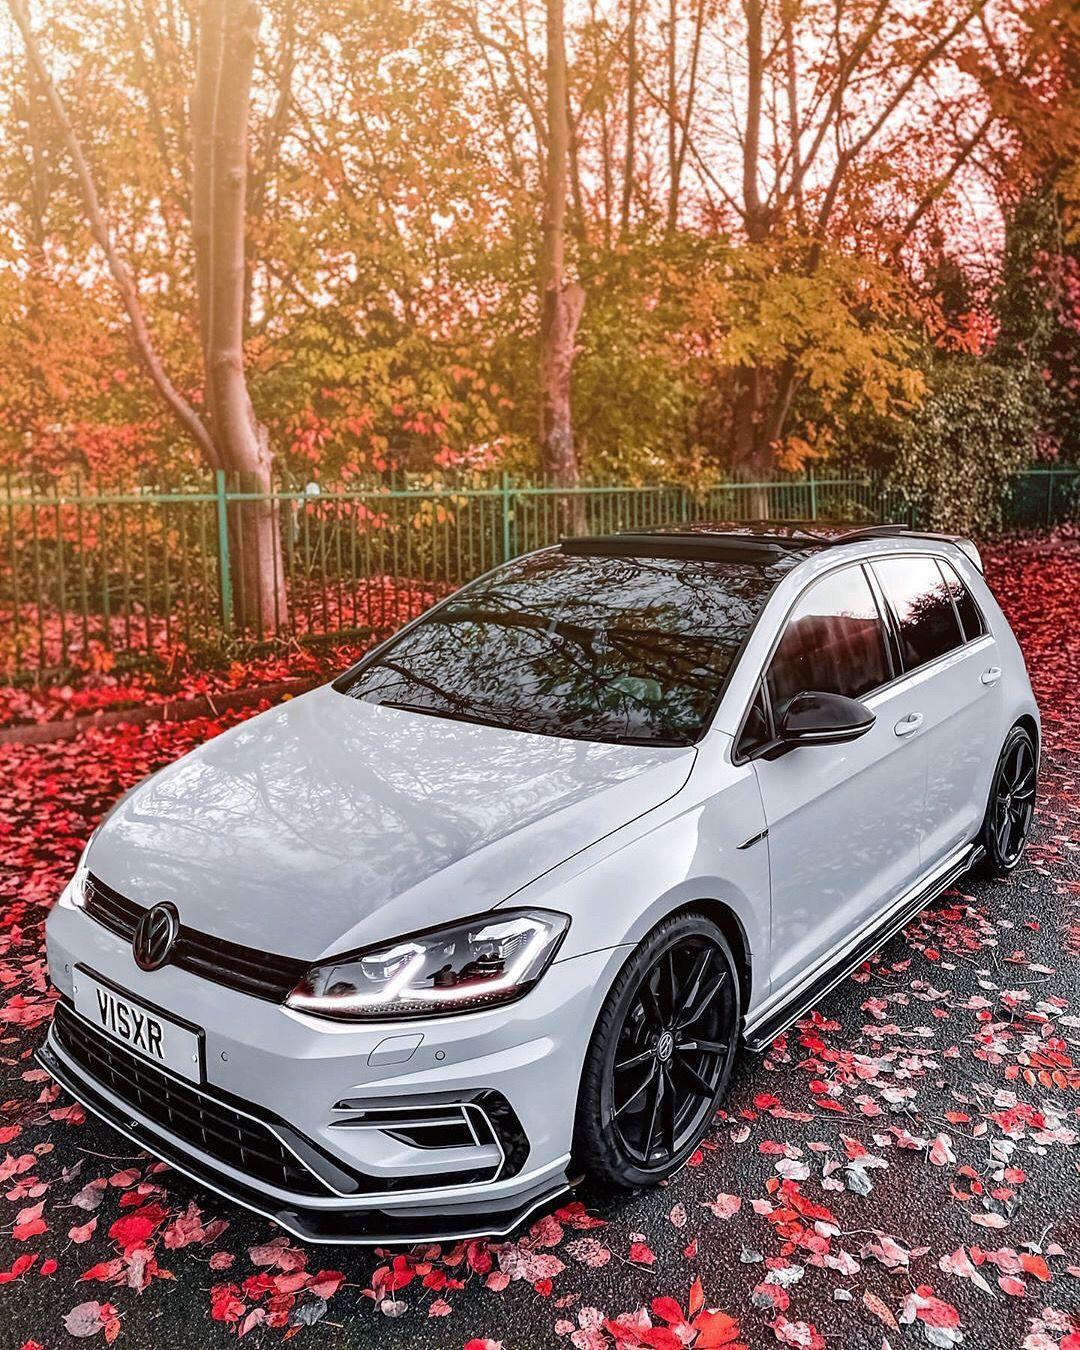 Golf 7 5 R In 2020 Vw Golf R Mk7 Car Volkswagen Volkswagen Car